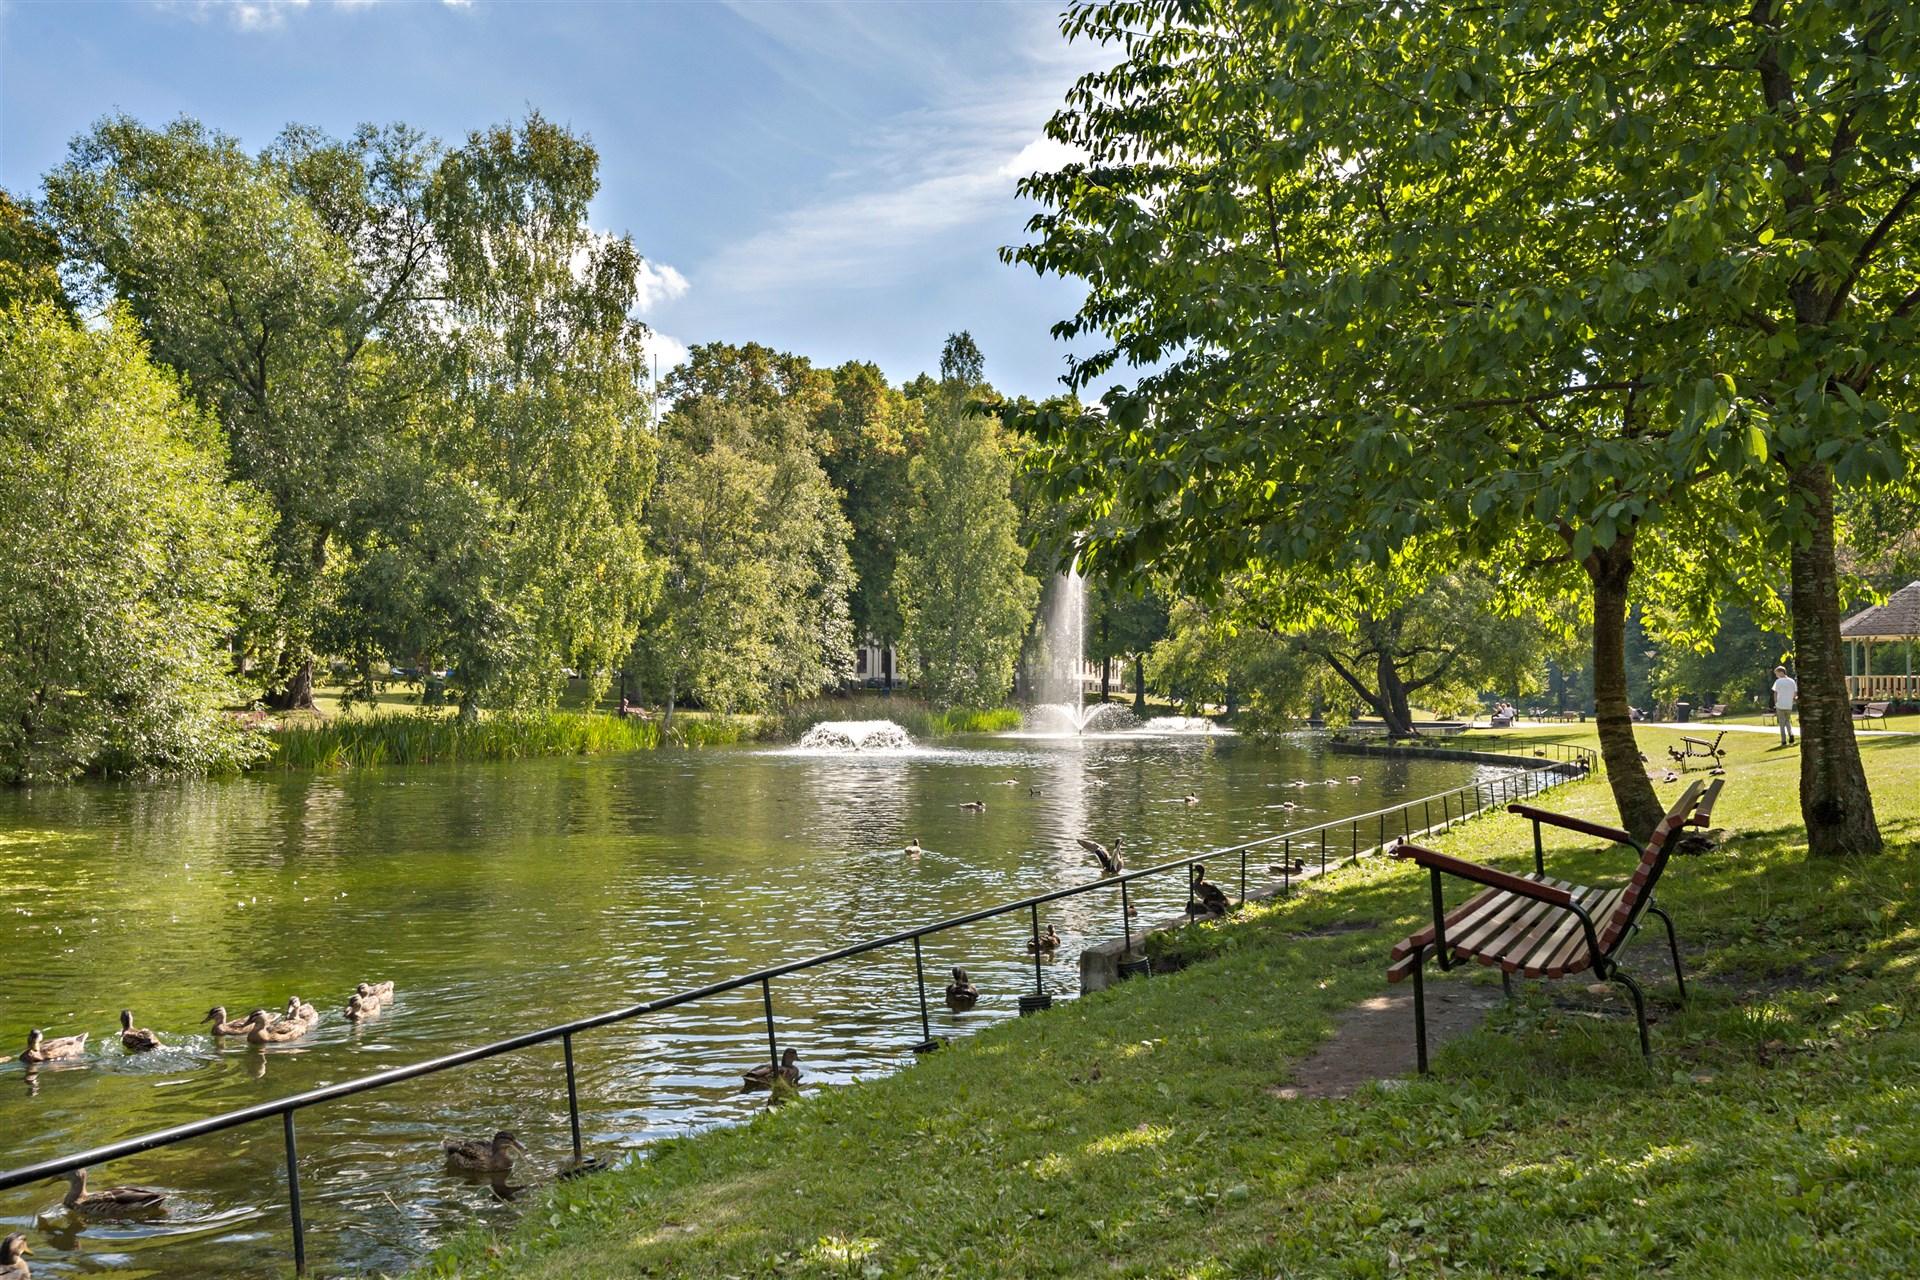 Den vackra dammen i parken